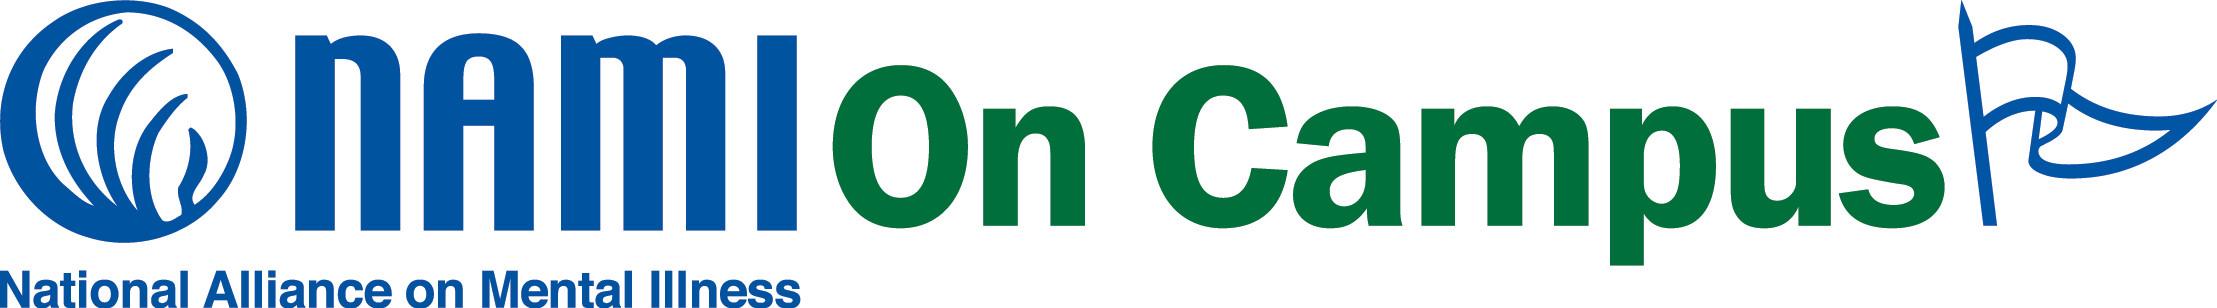 Image result for NAMI on Campus logo